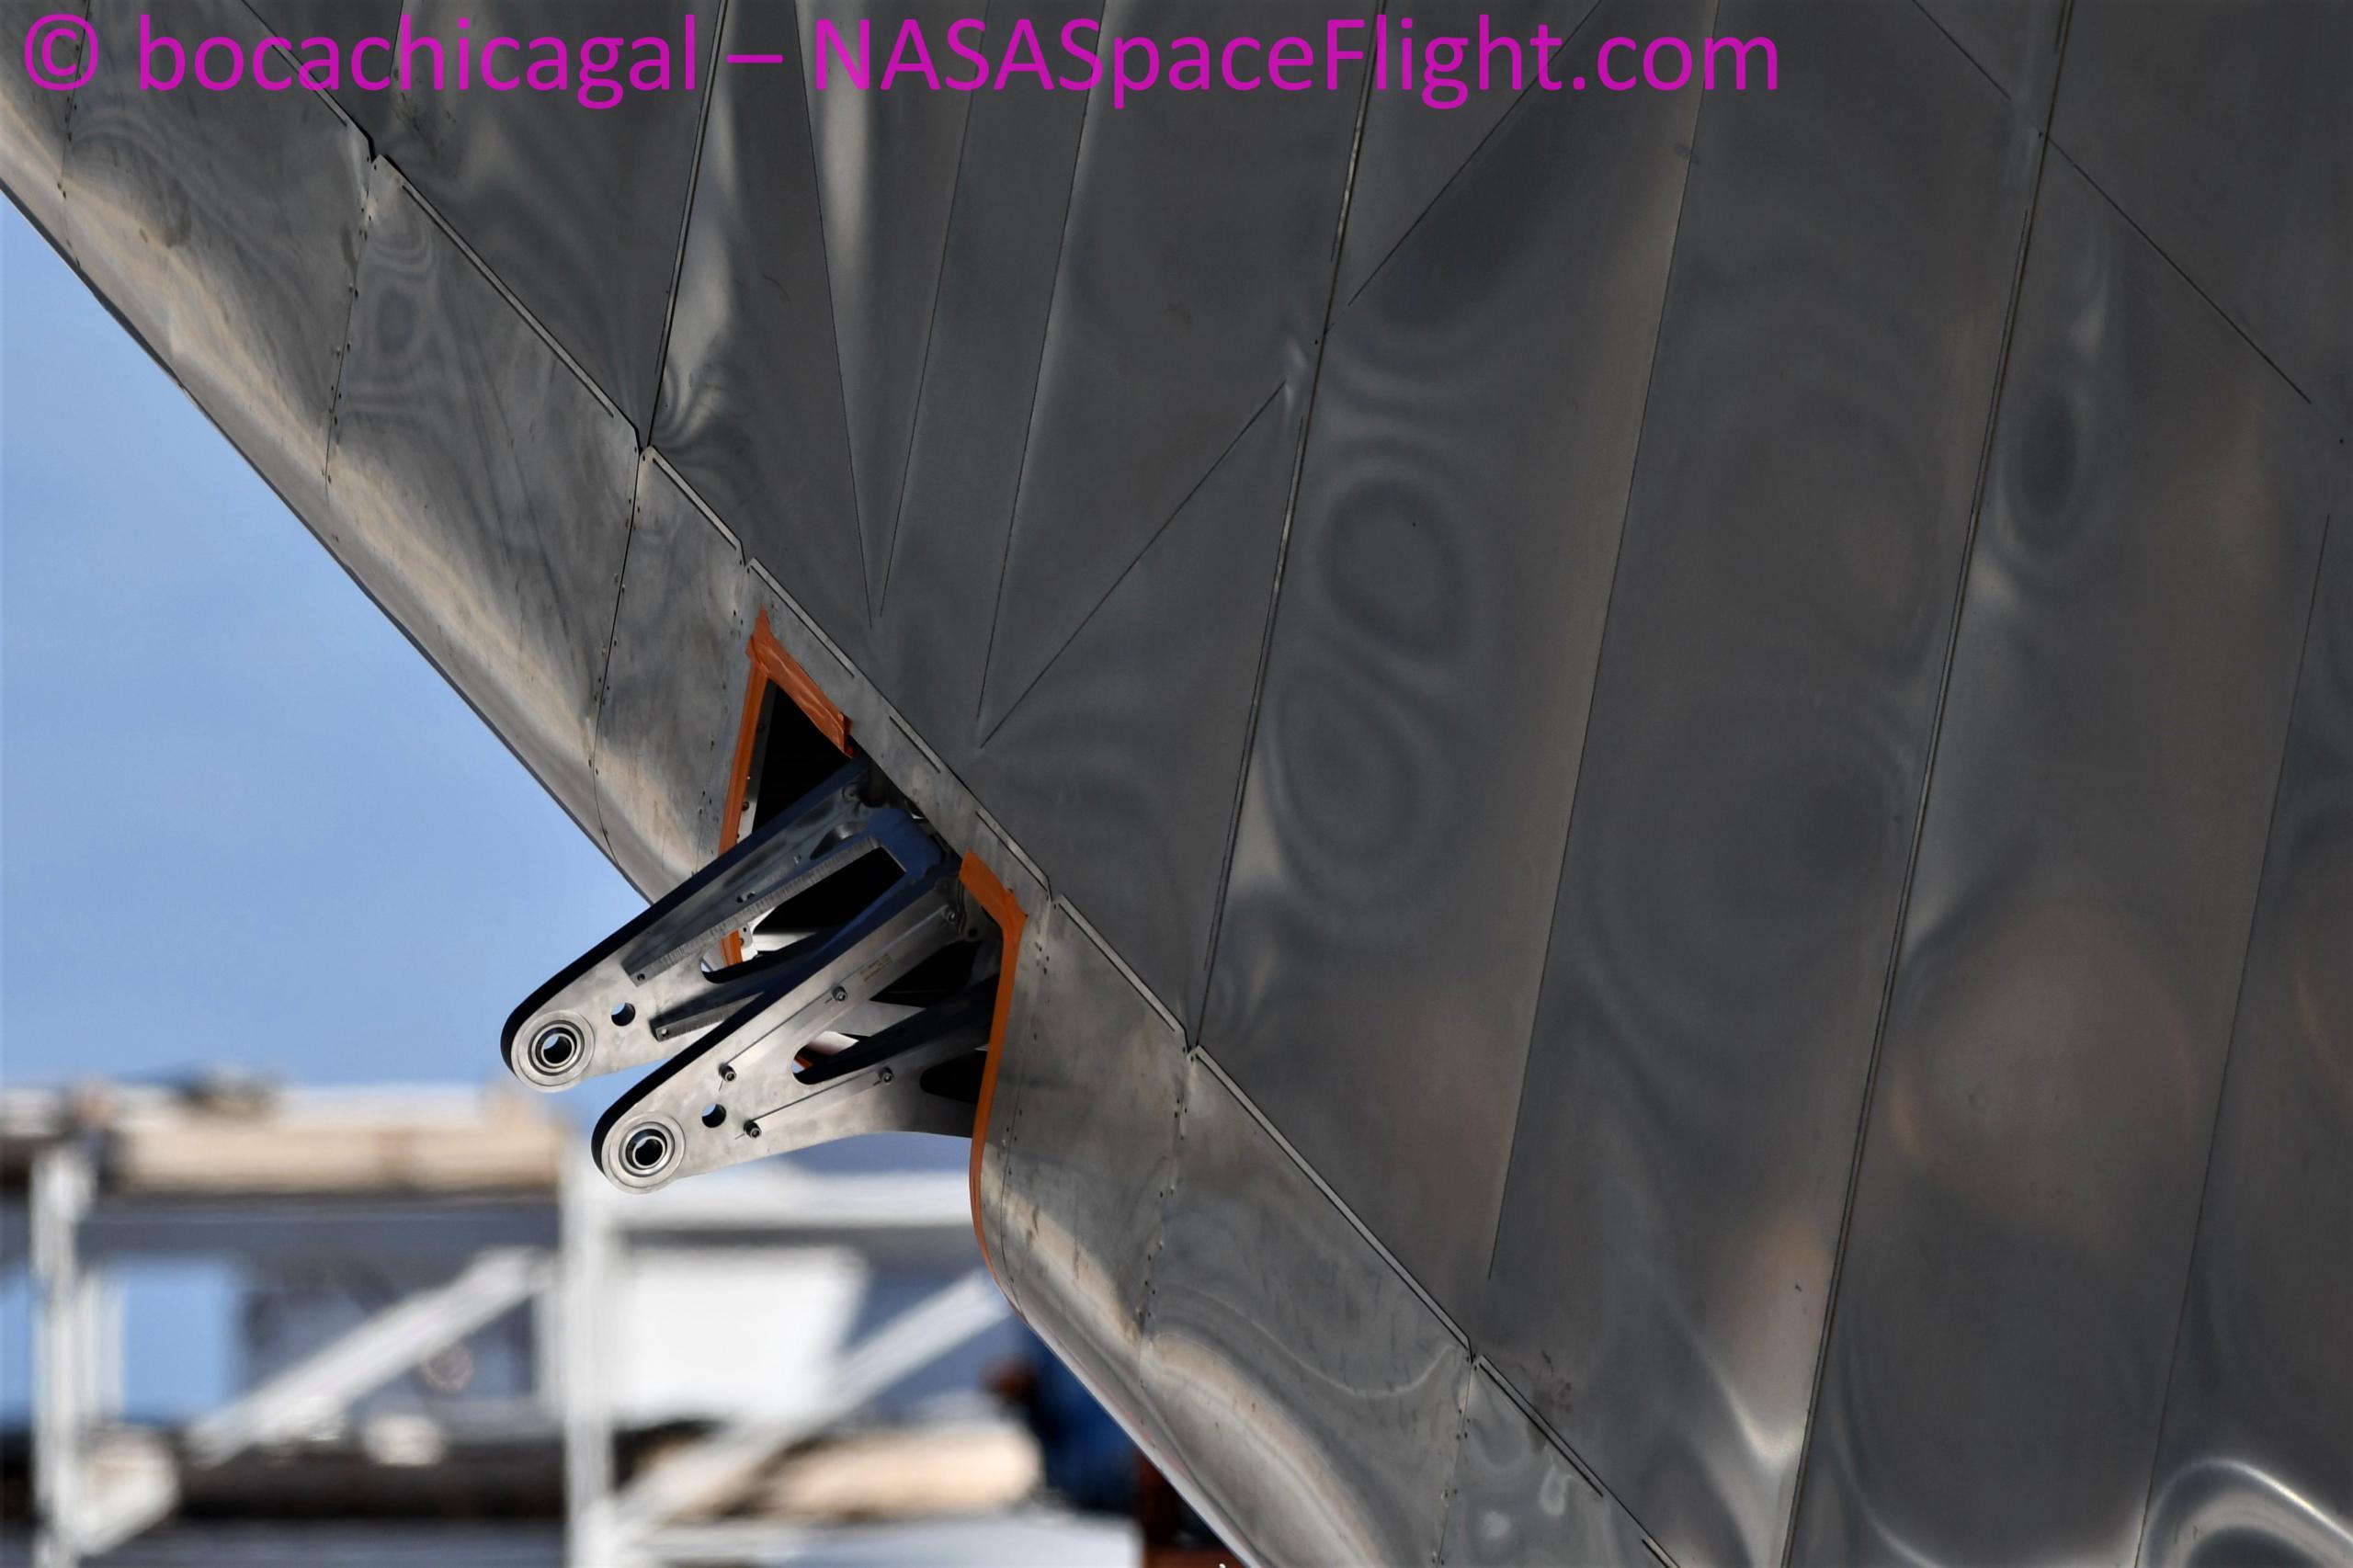 Starship Boca Chica 092220 (NASASpaceflight – bocachicagal) SN8 flap install 3 (c)